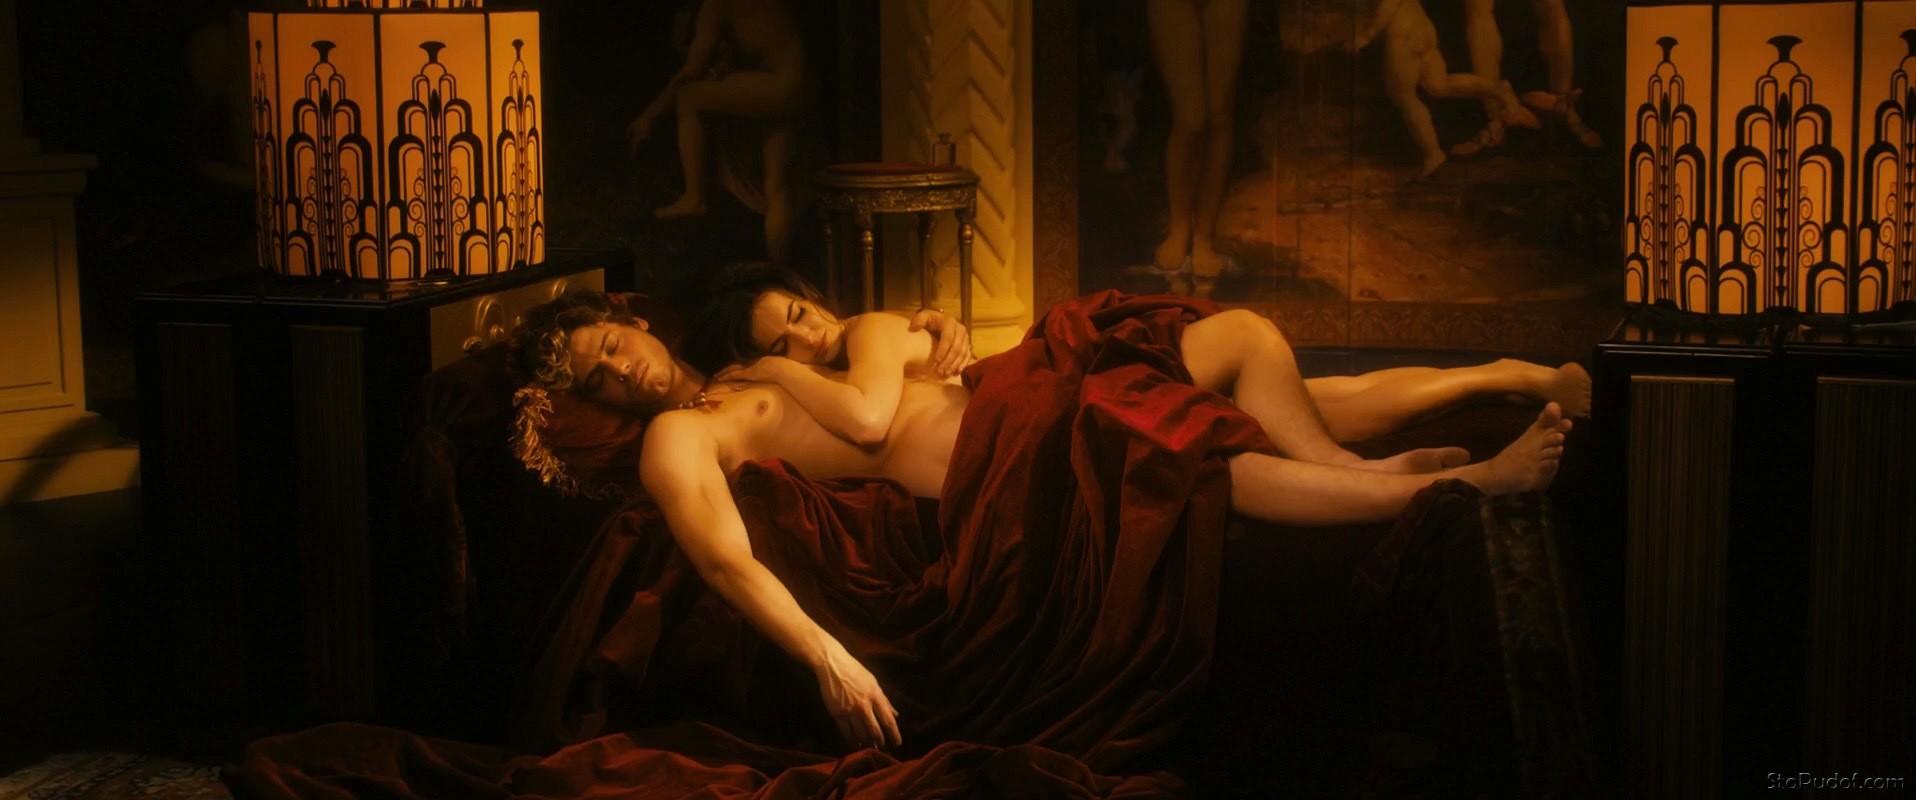 Camilla belle nude scene ex girlfriend photos